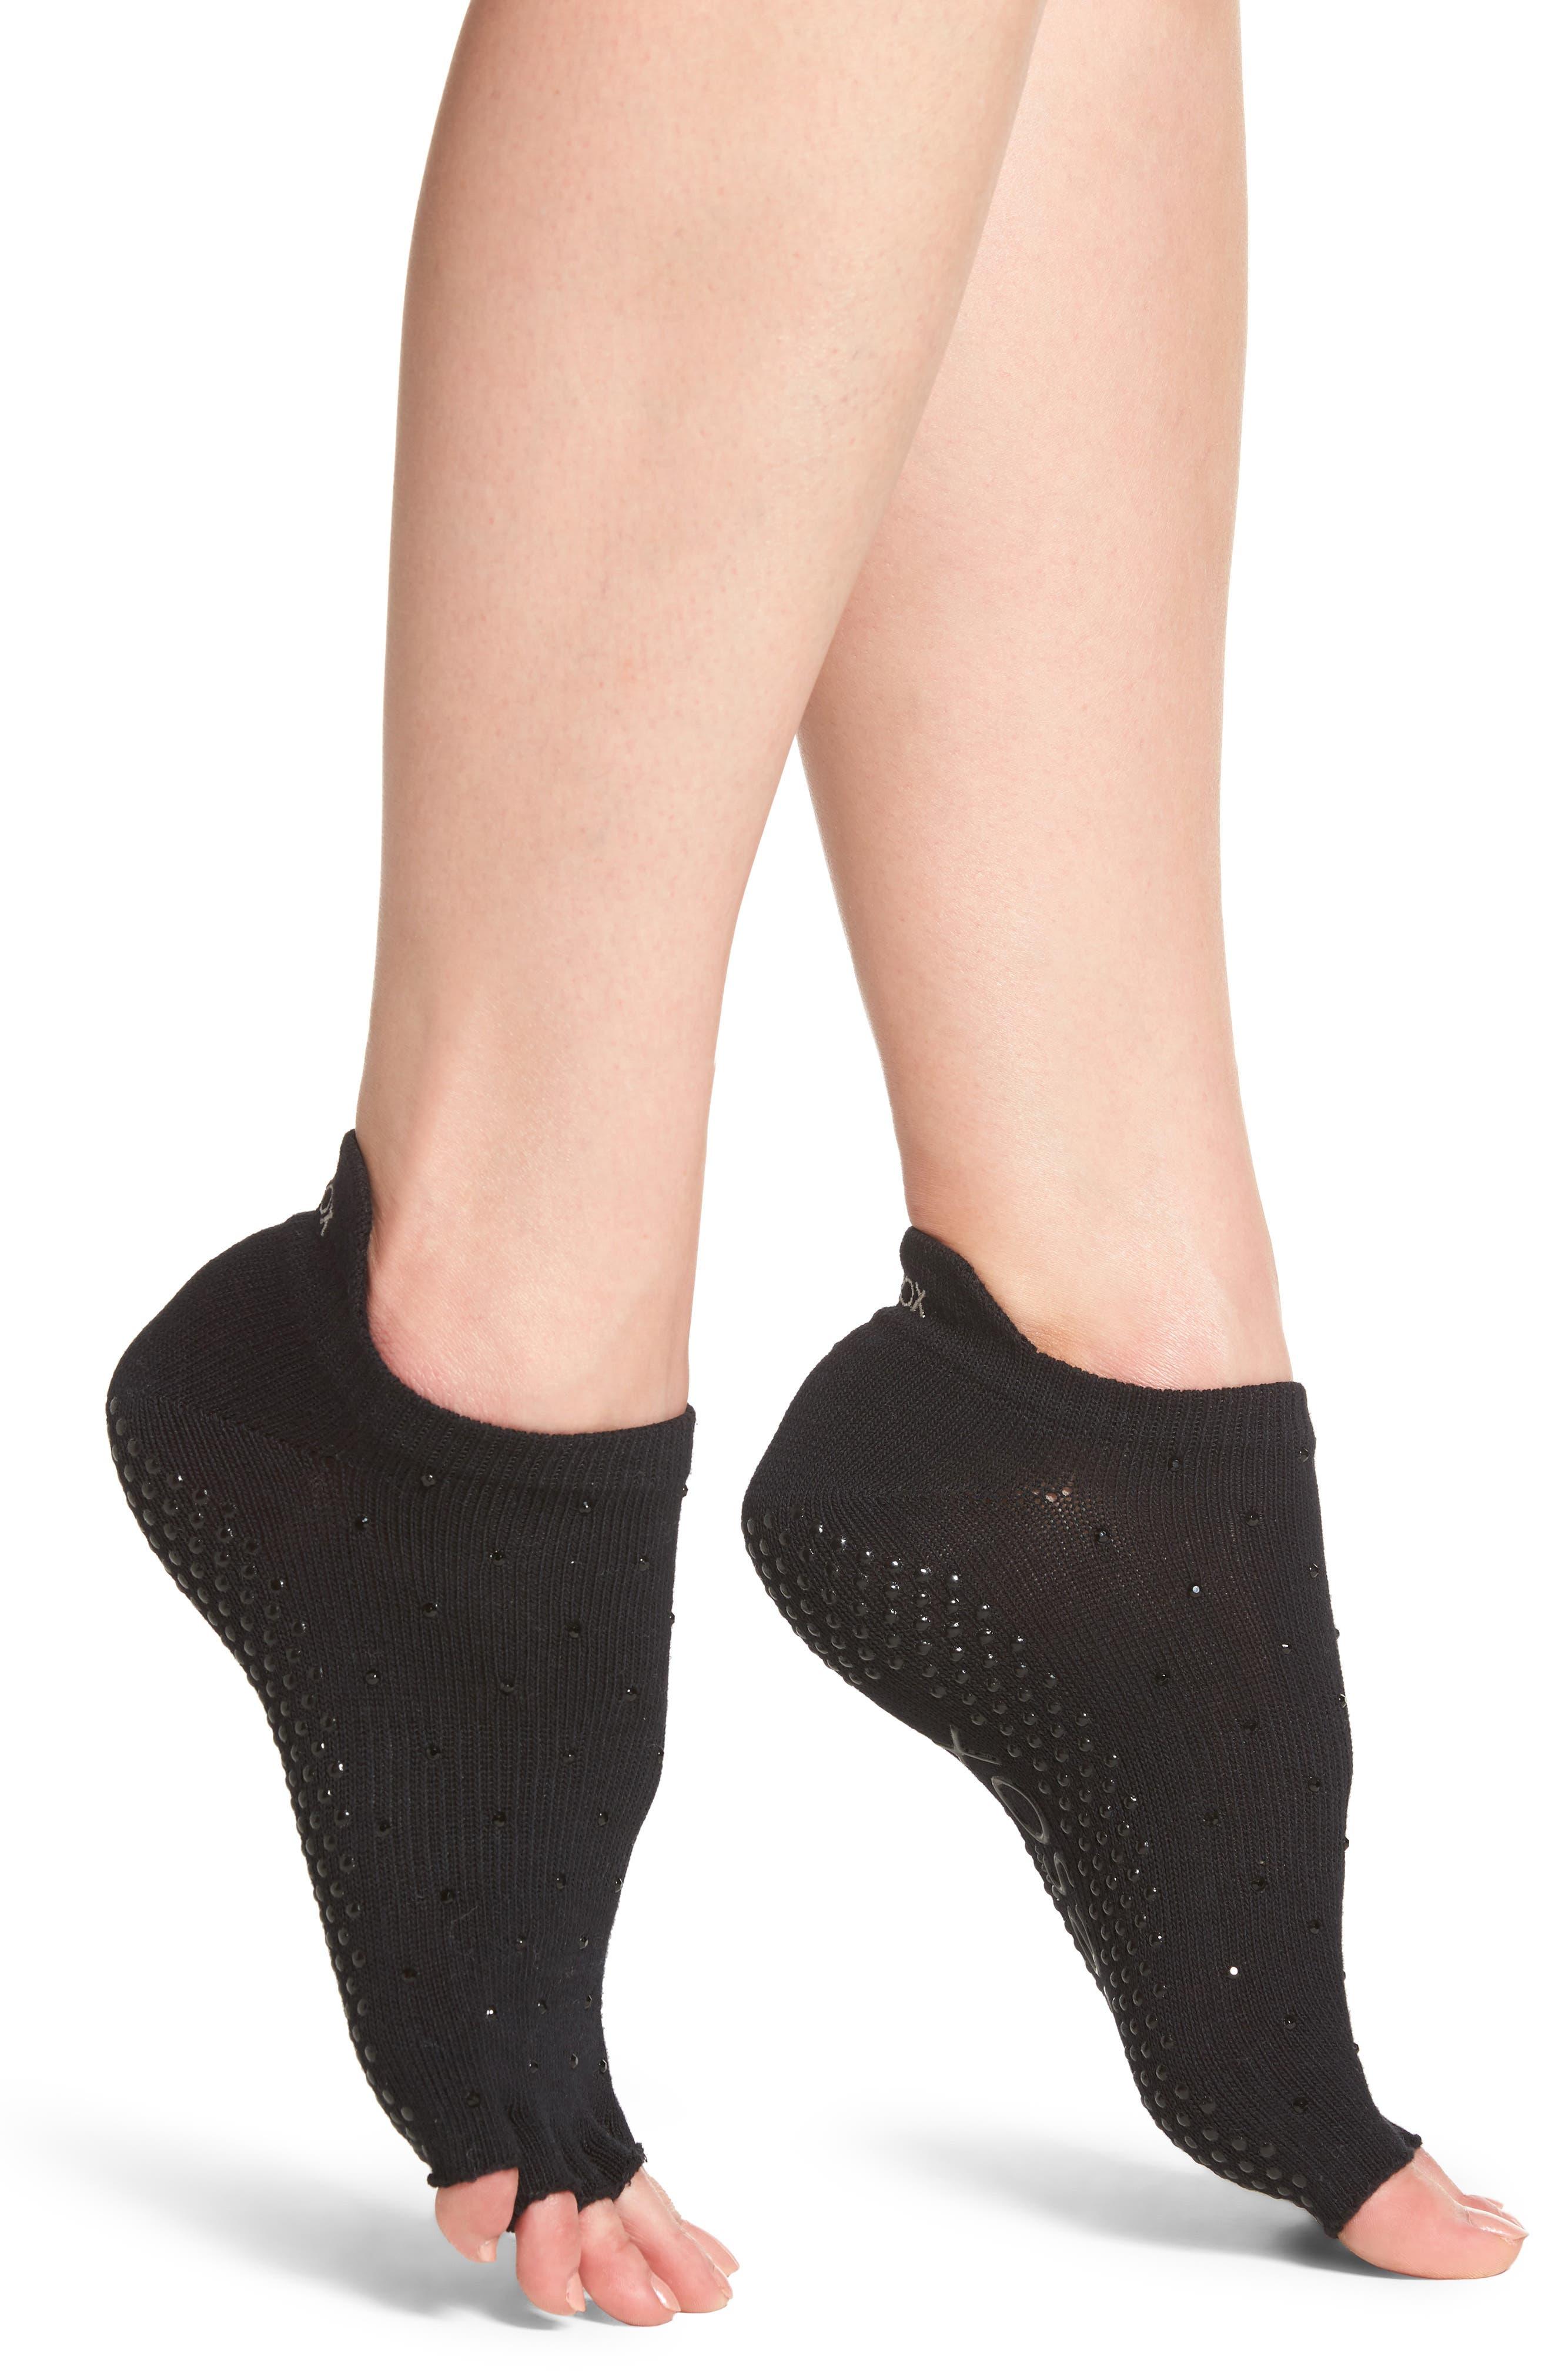 Alternate Image 1 Selected - ToeSox Half Toe Low Rise Grip Socks